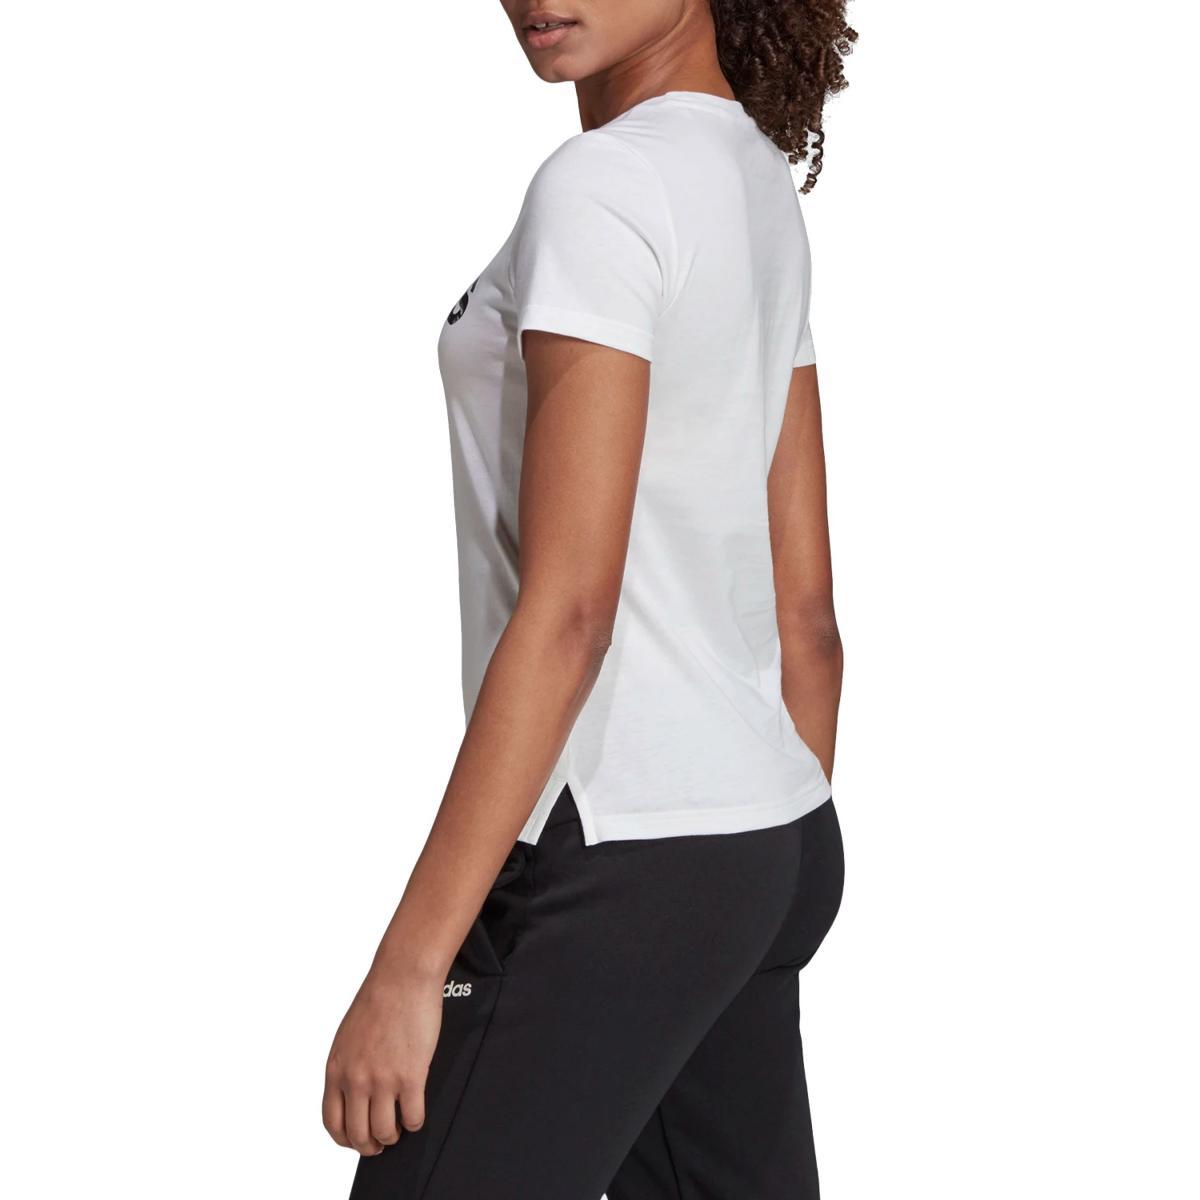 T-shirt Adidas girocollo con stampa Brush Effect Logo Graphic Tee da donna rif. EI4559